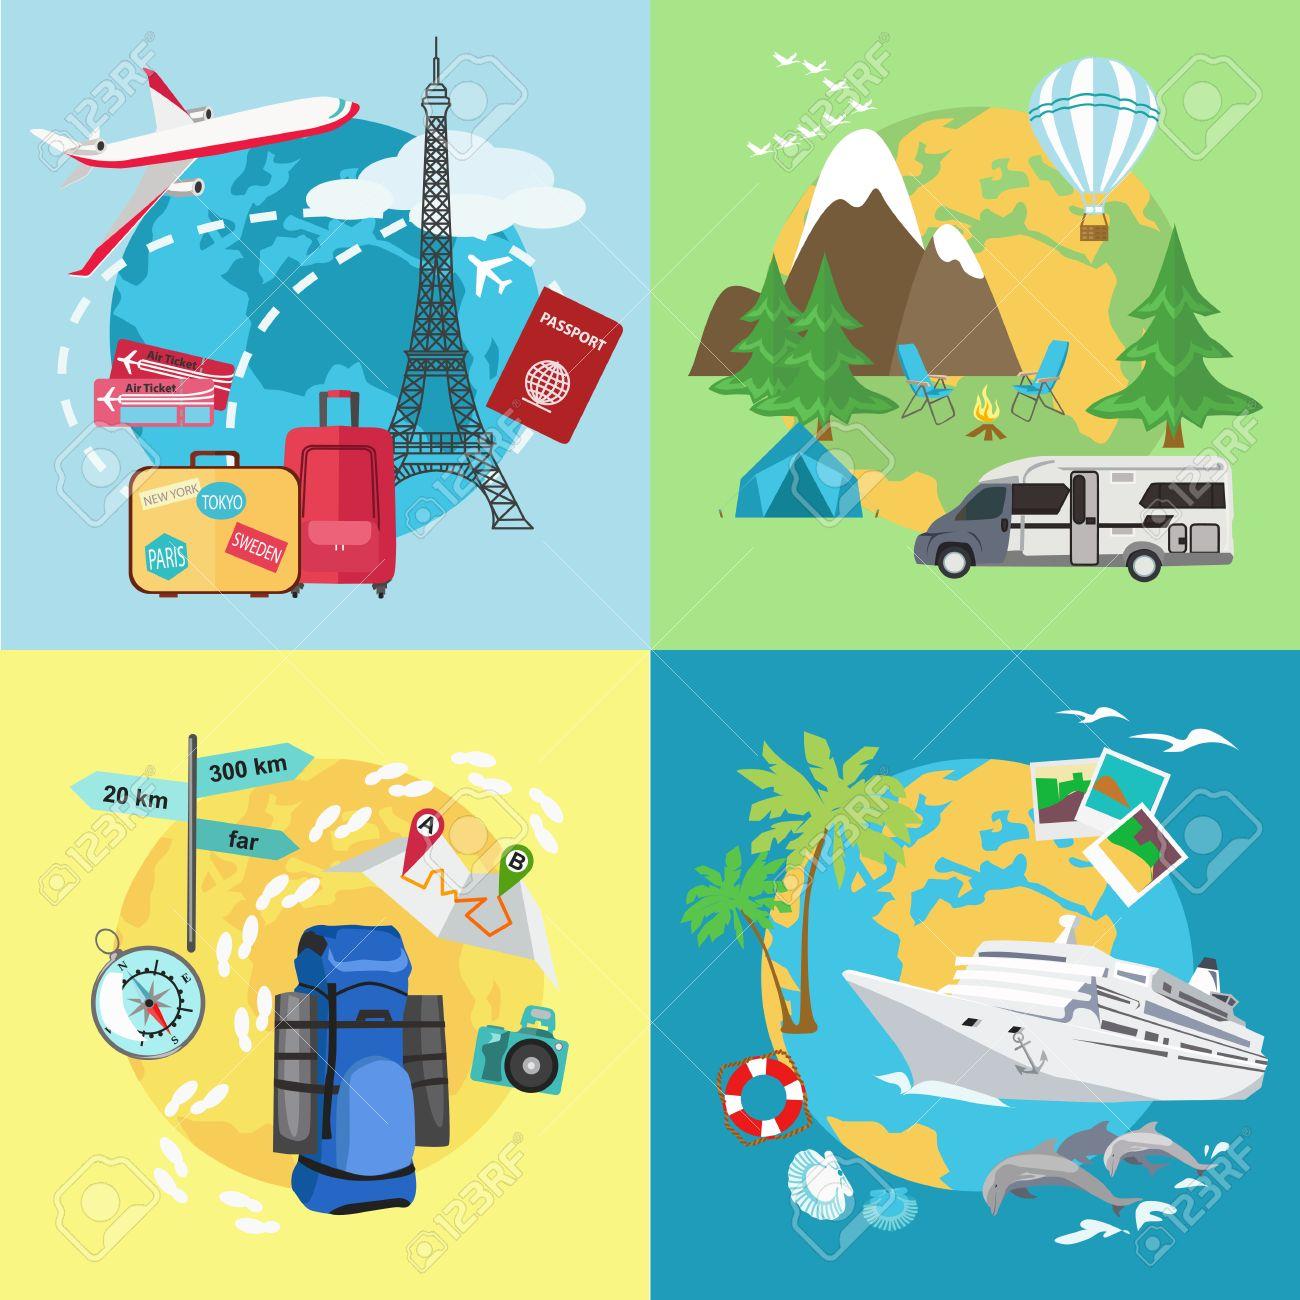 Bharath International Travels